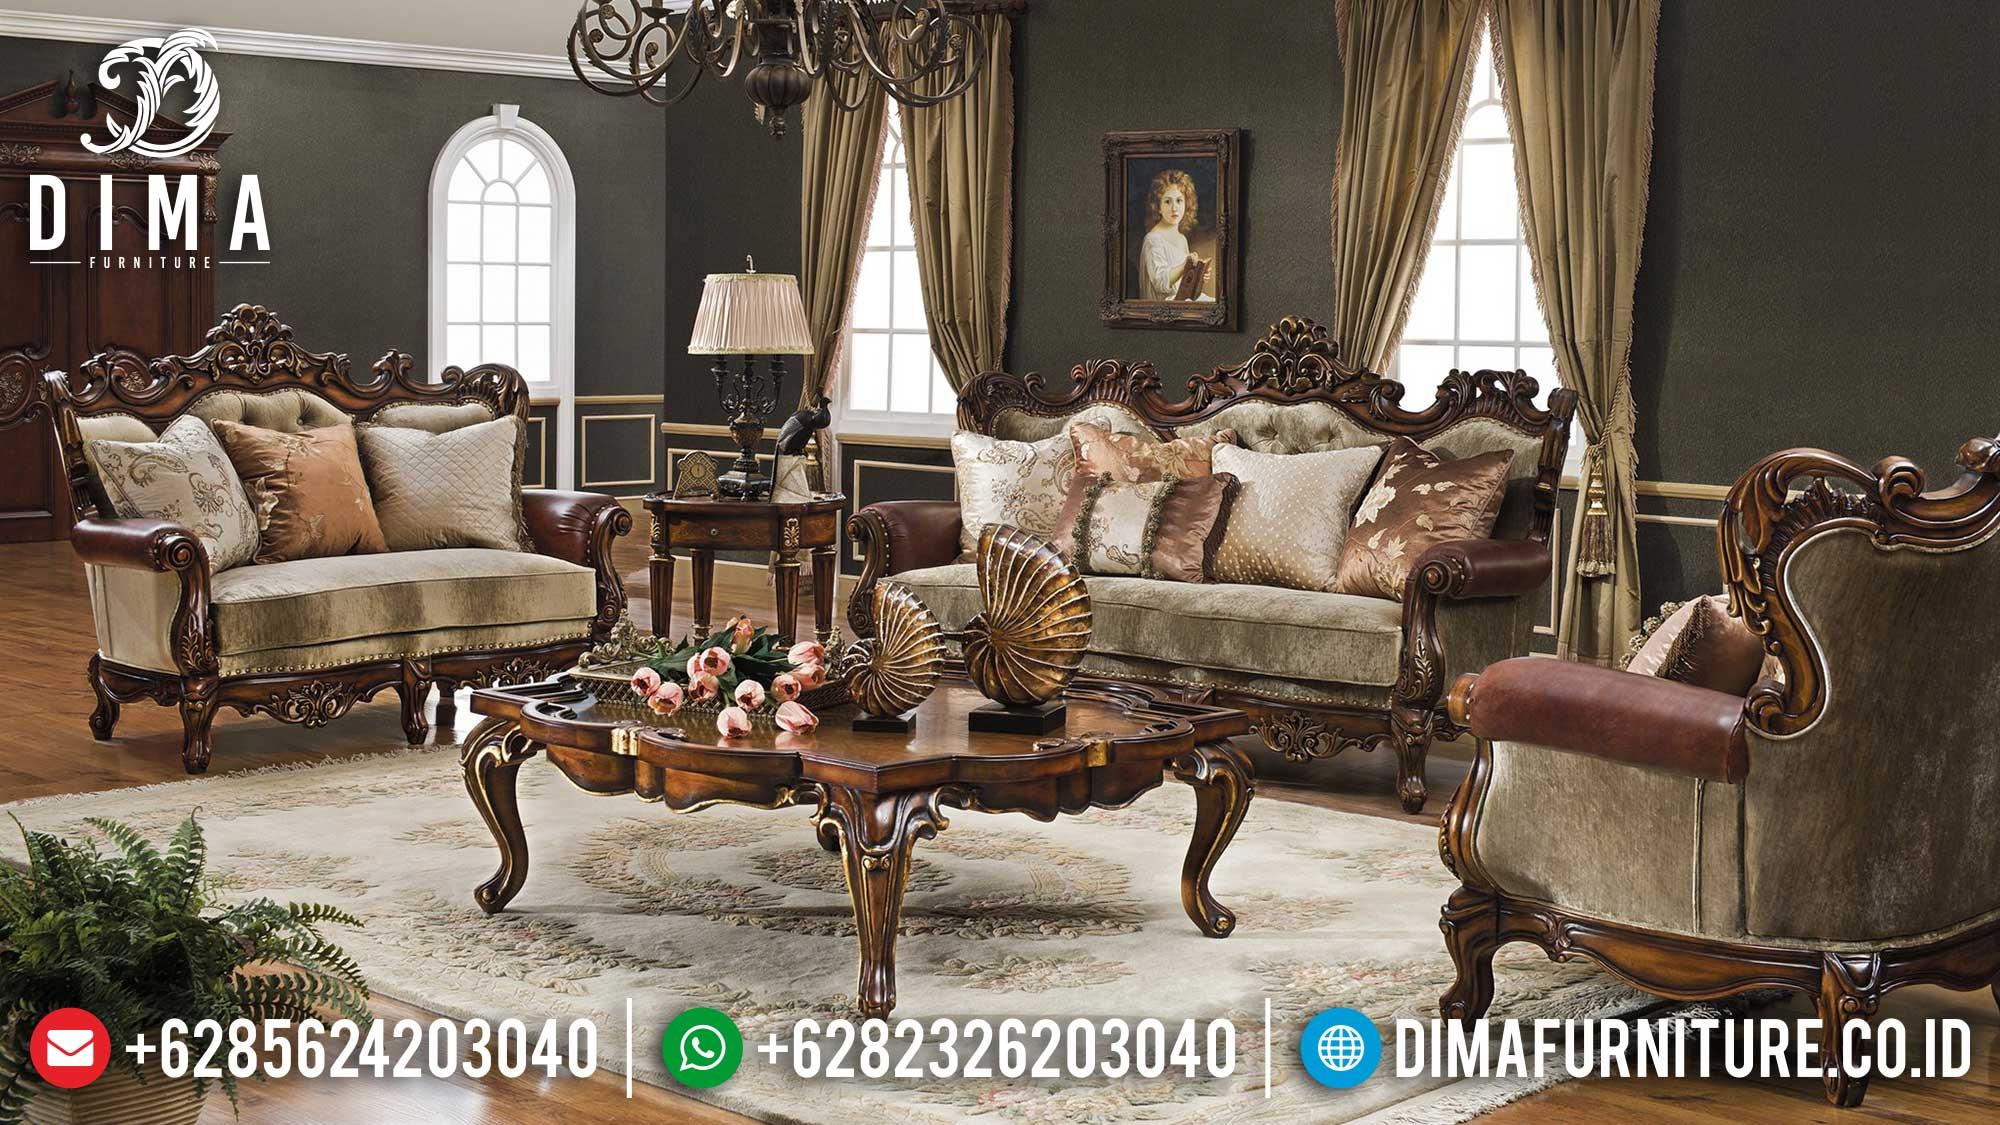 Harga Sofa Tamu Mewah Jepara Luxury Carving Italian Palace Design ST-1292